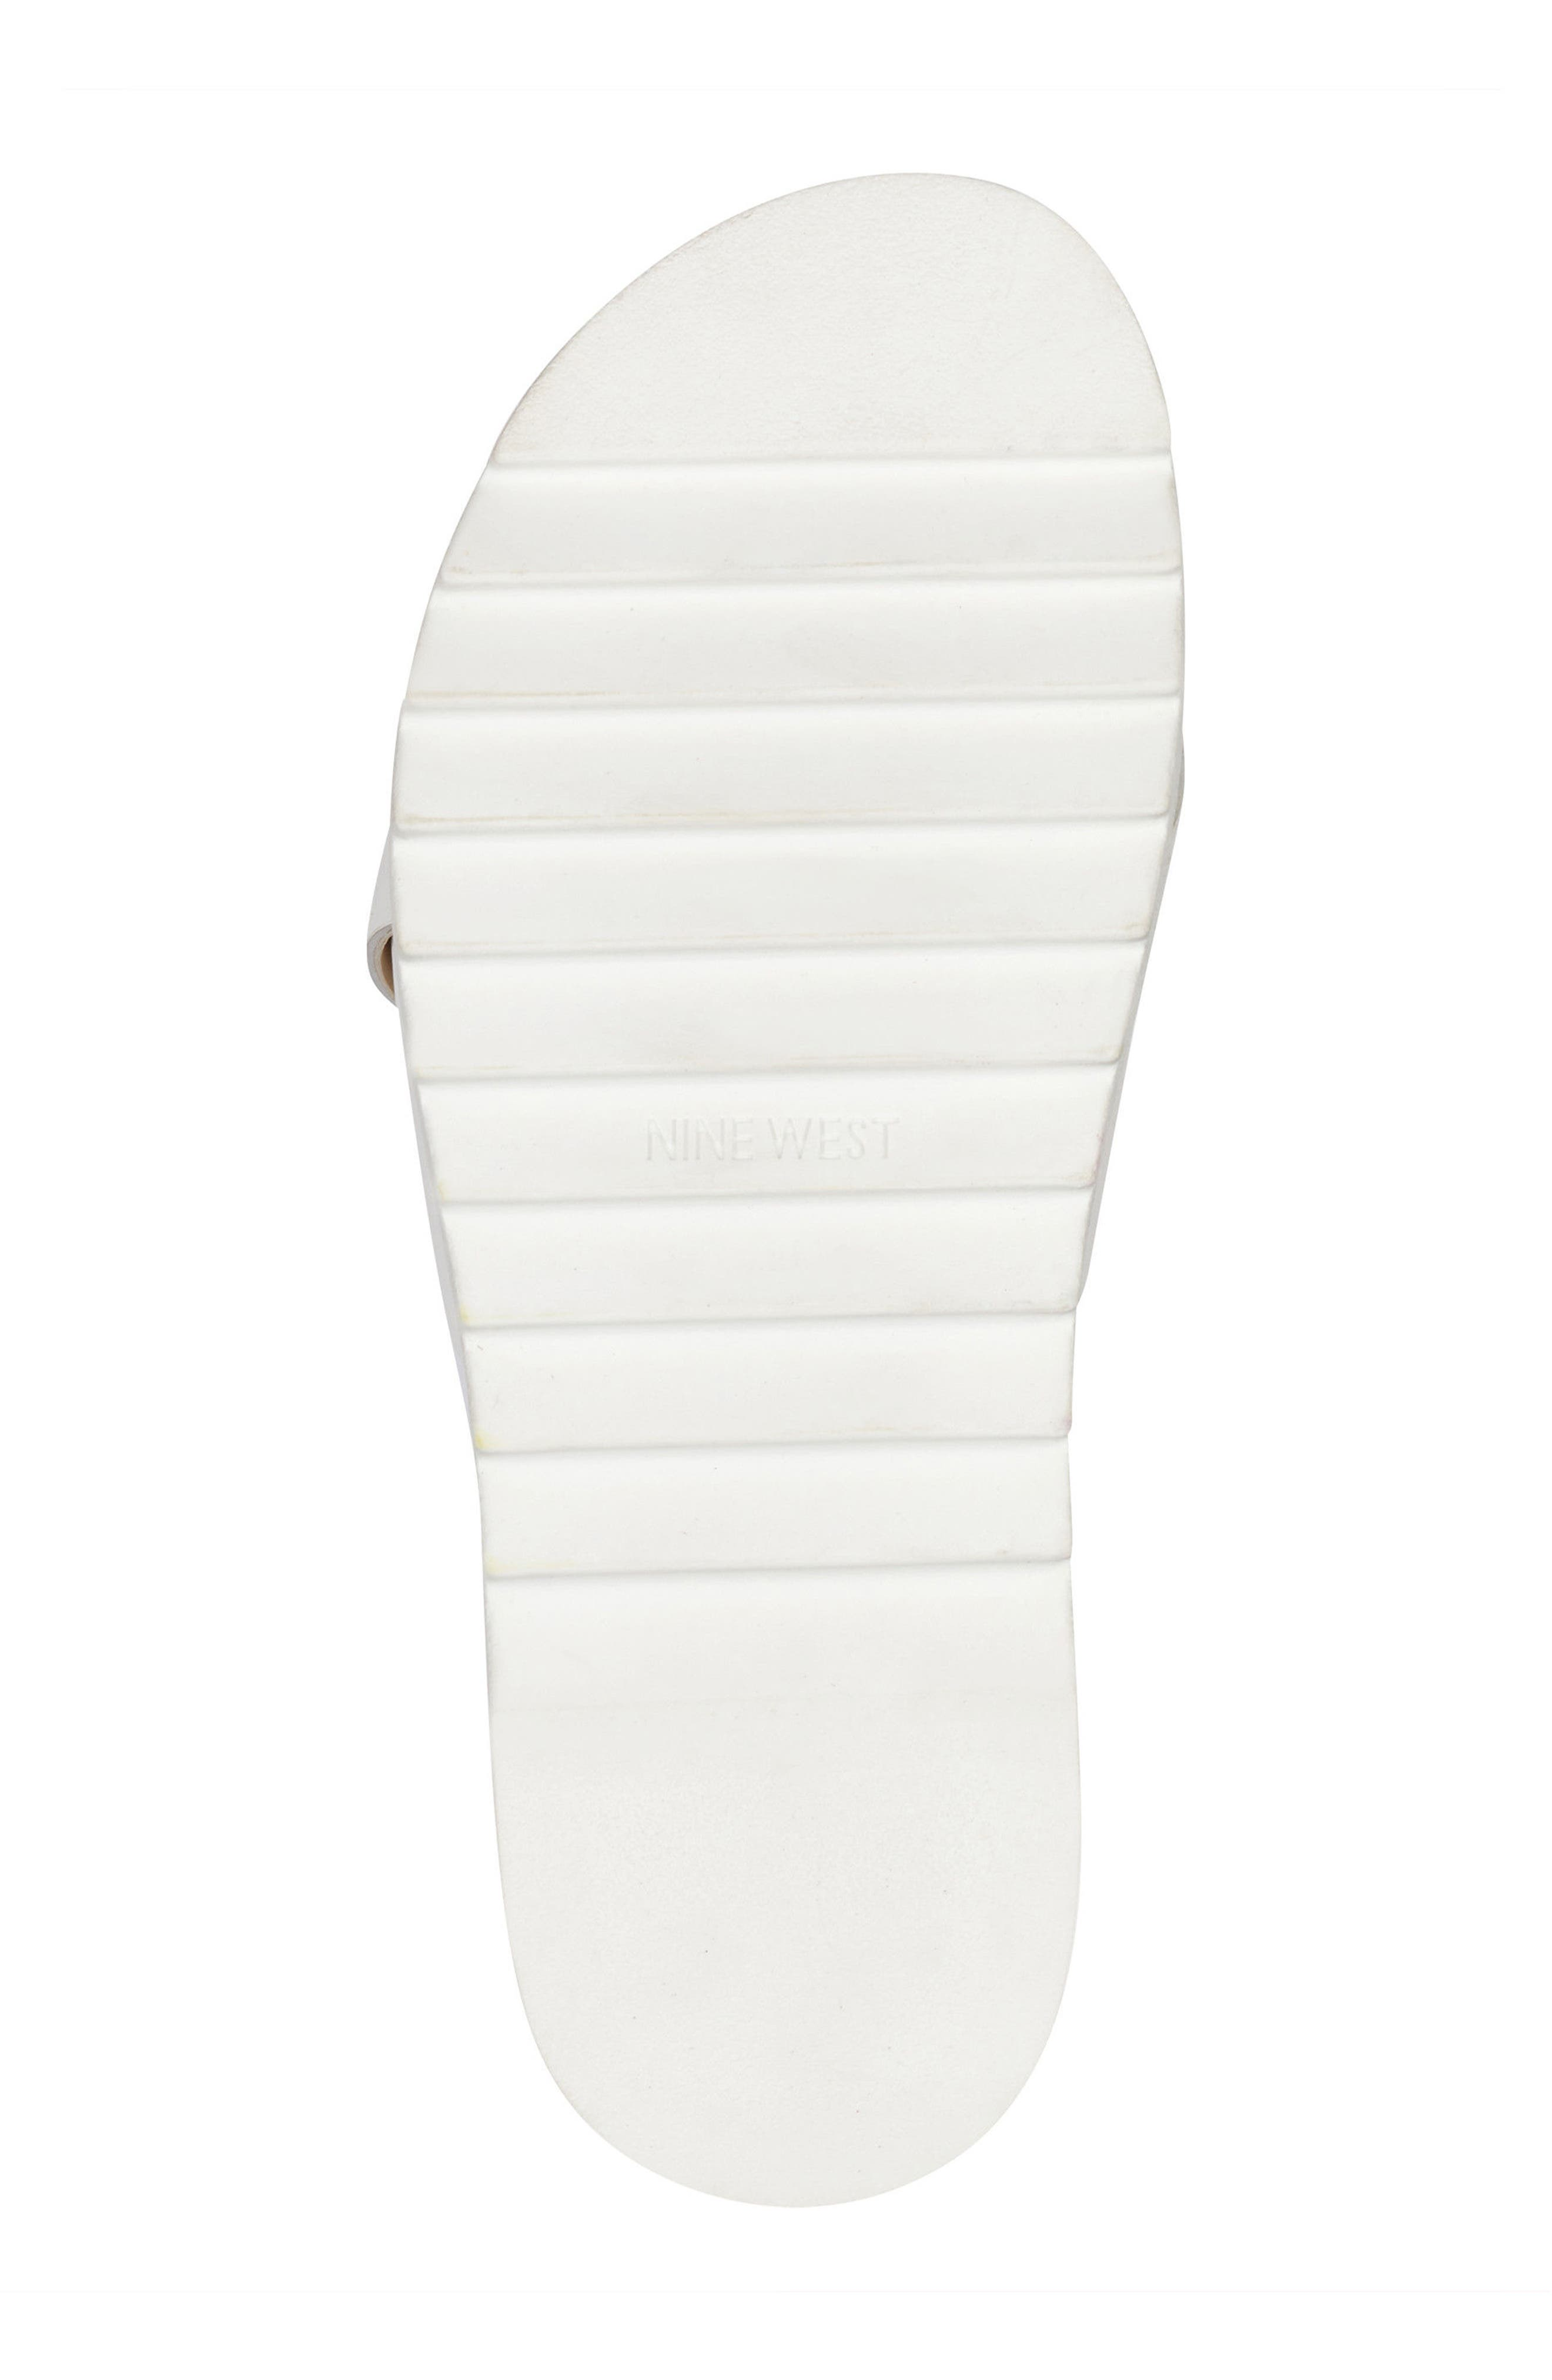 Furaish Slide Sandal,                             Alternate thumbnail 6, color,                             White Leather